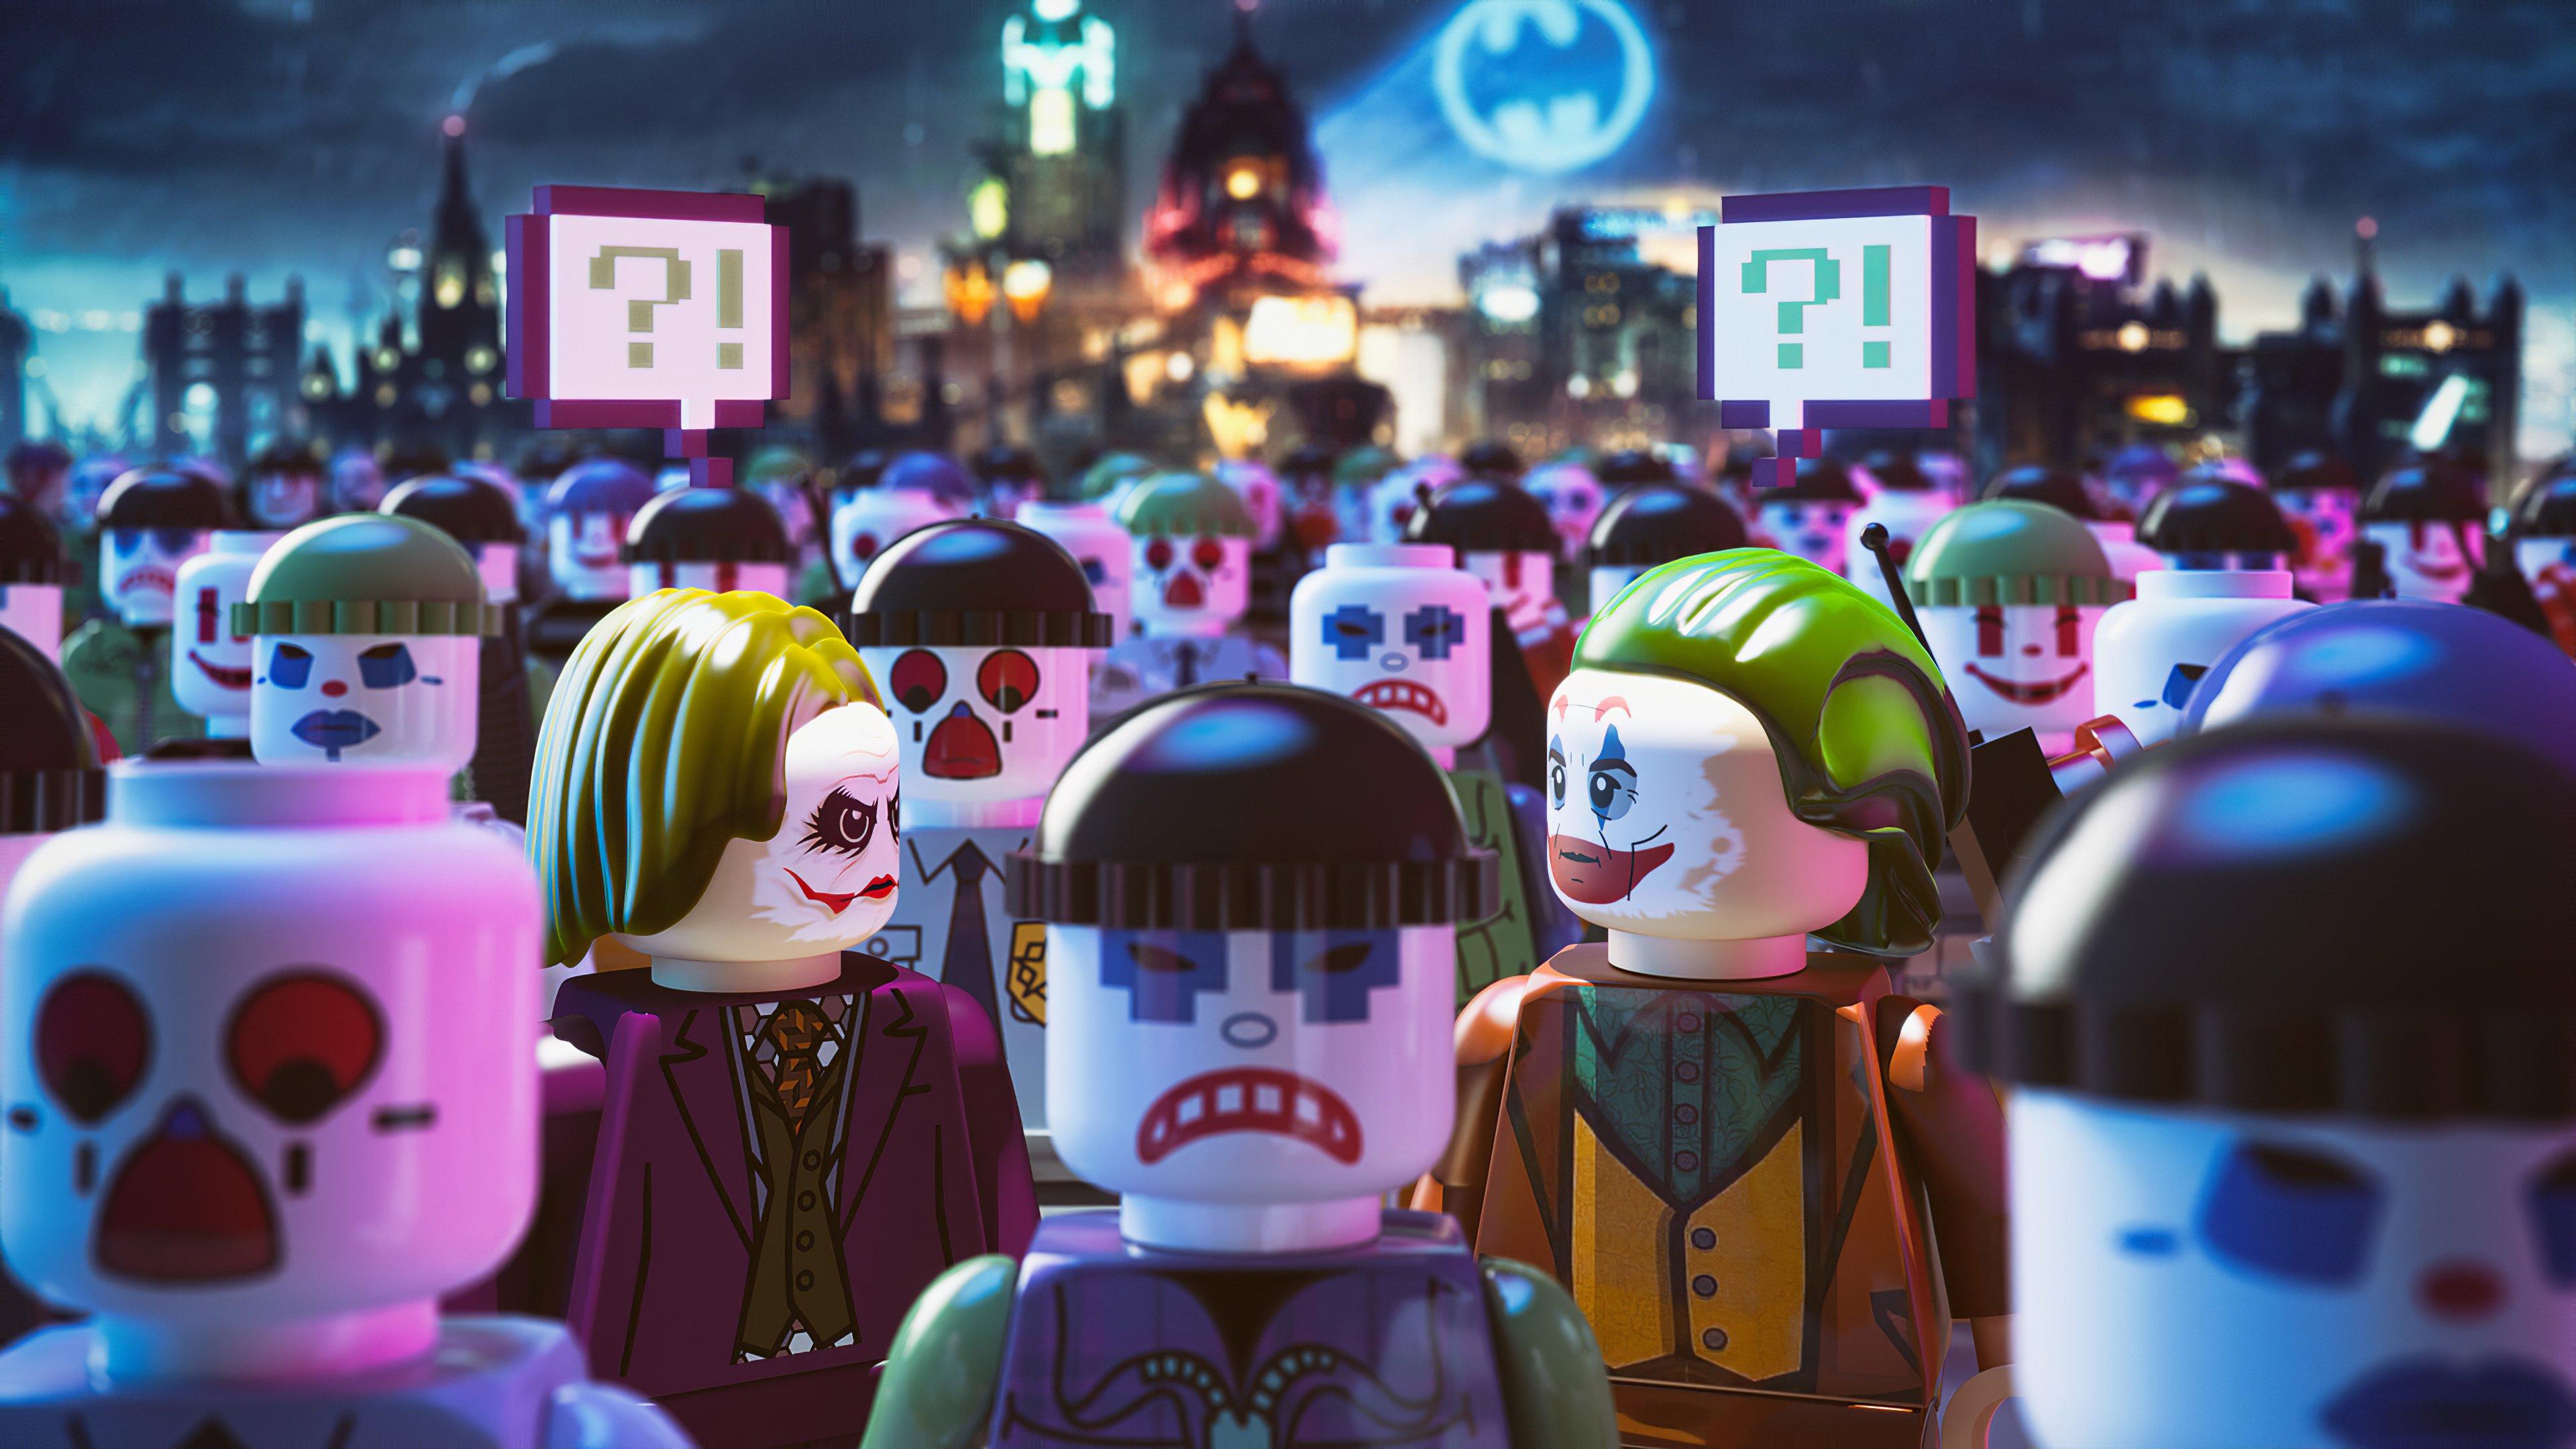 Fondos de pantalla Versiones del Guasón Lego